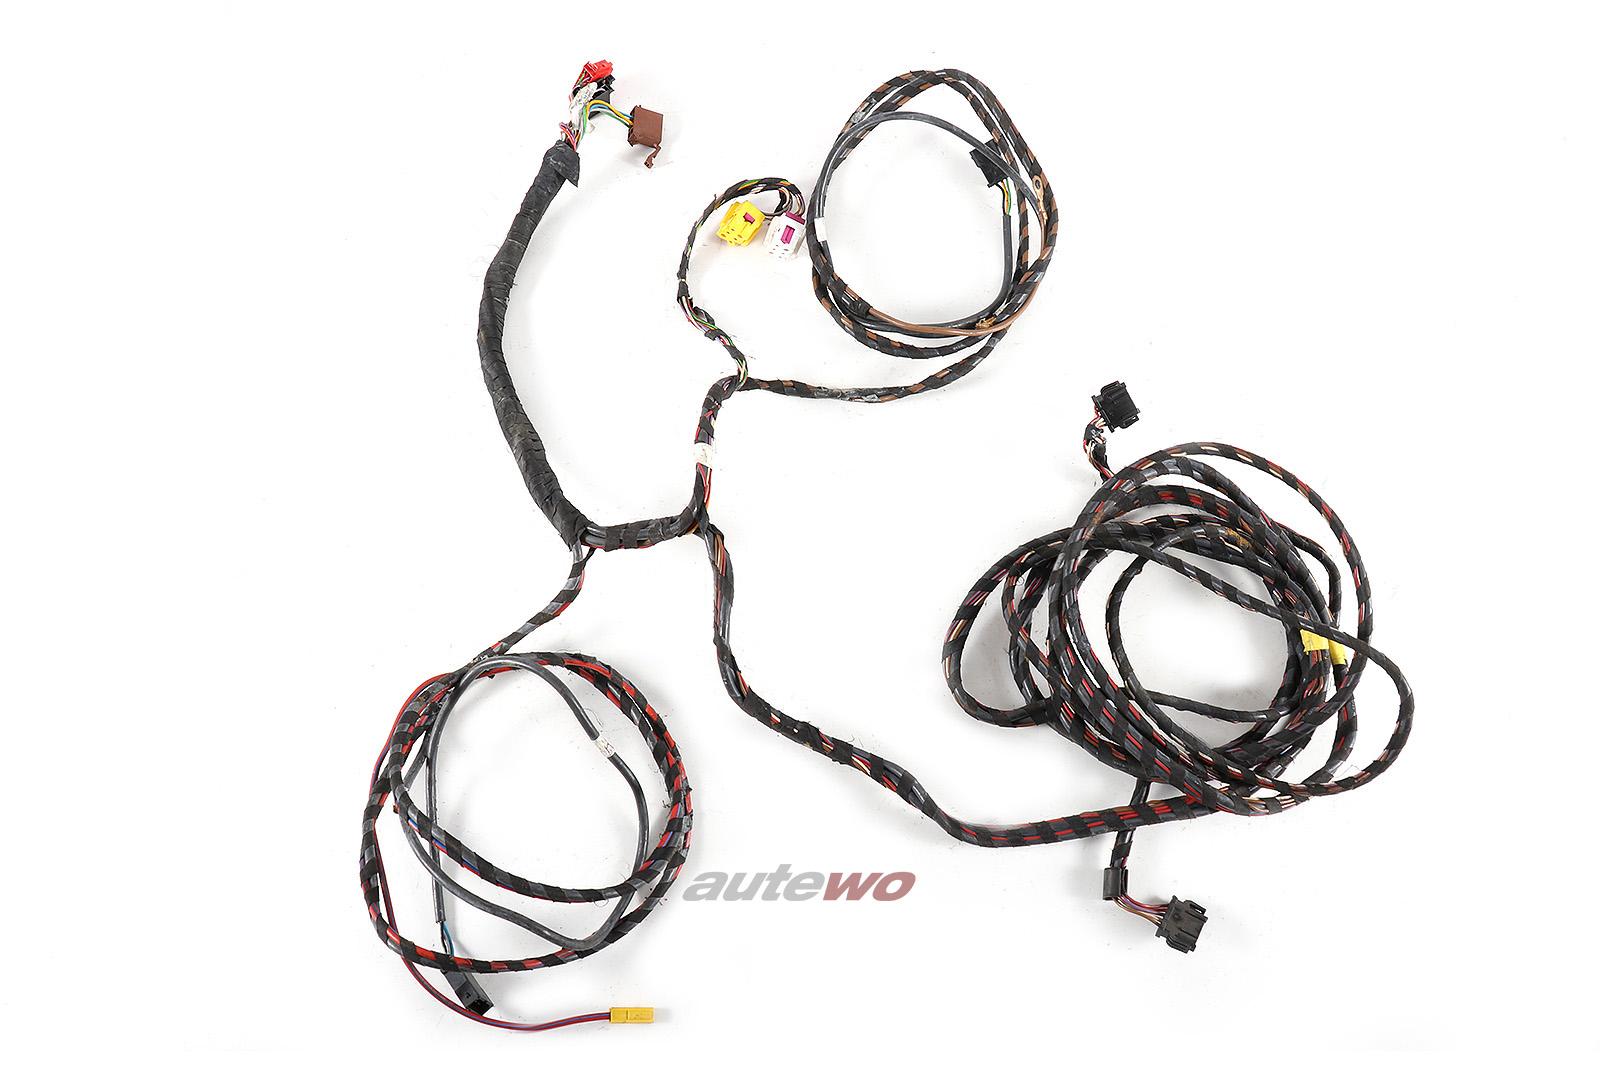 4A5971733 Audi 100/S4/A6/S6+ C4 Limousine Kabelbaum Aktivsoundsystem